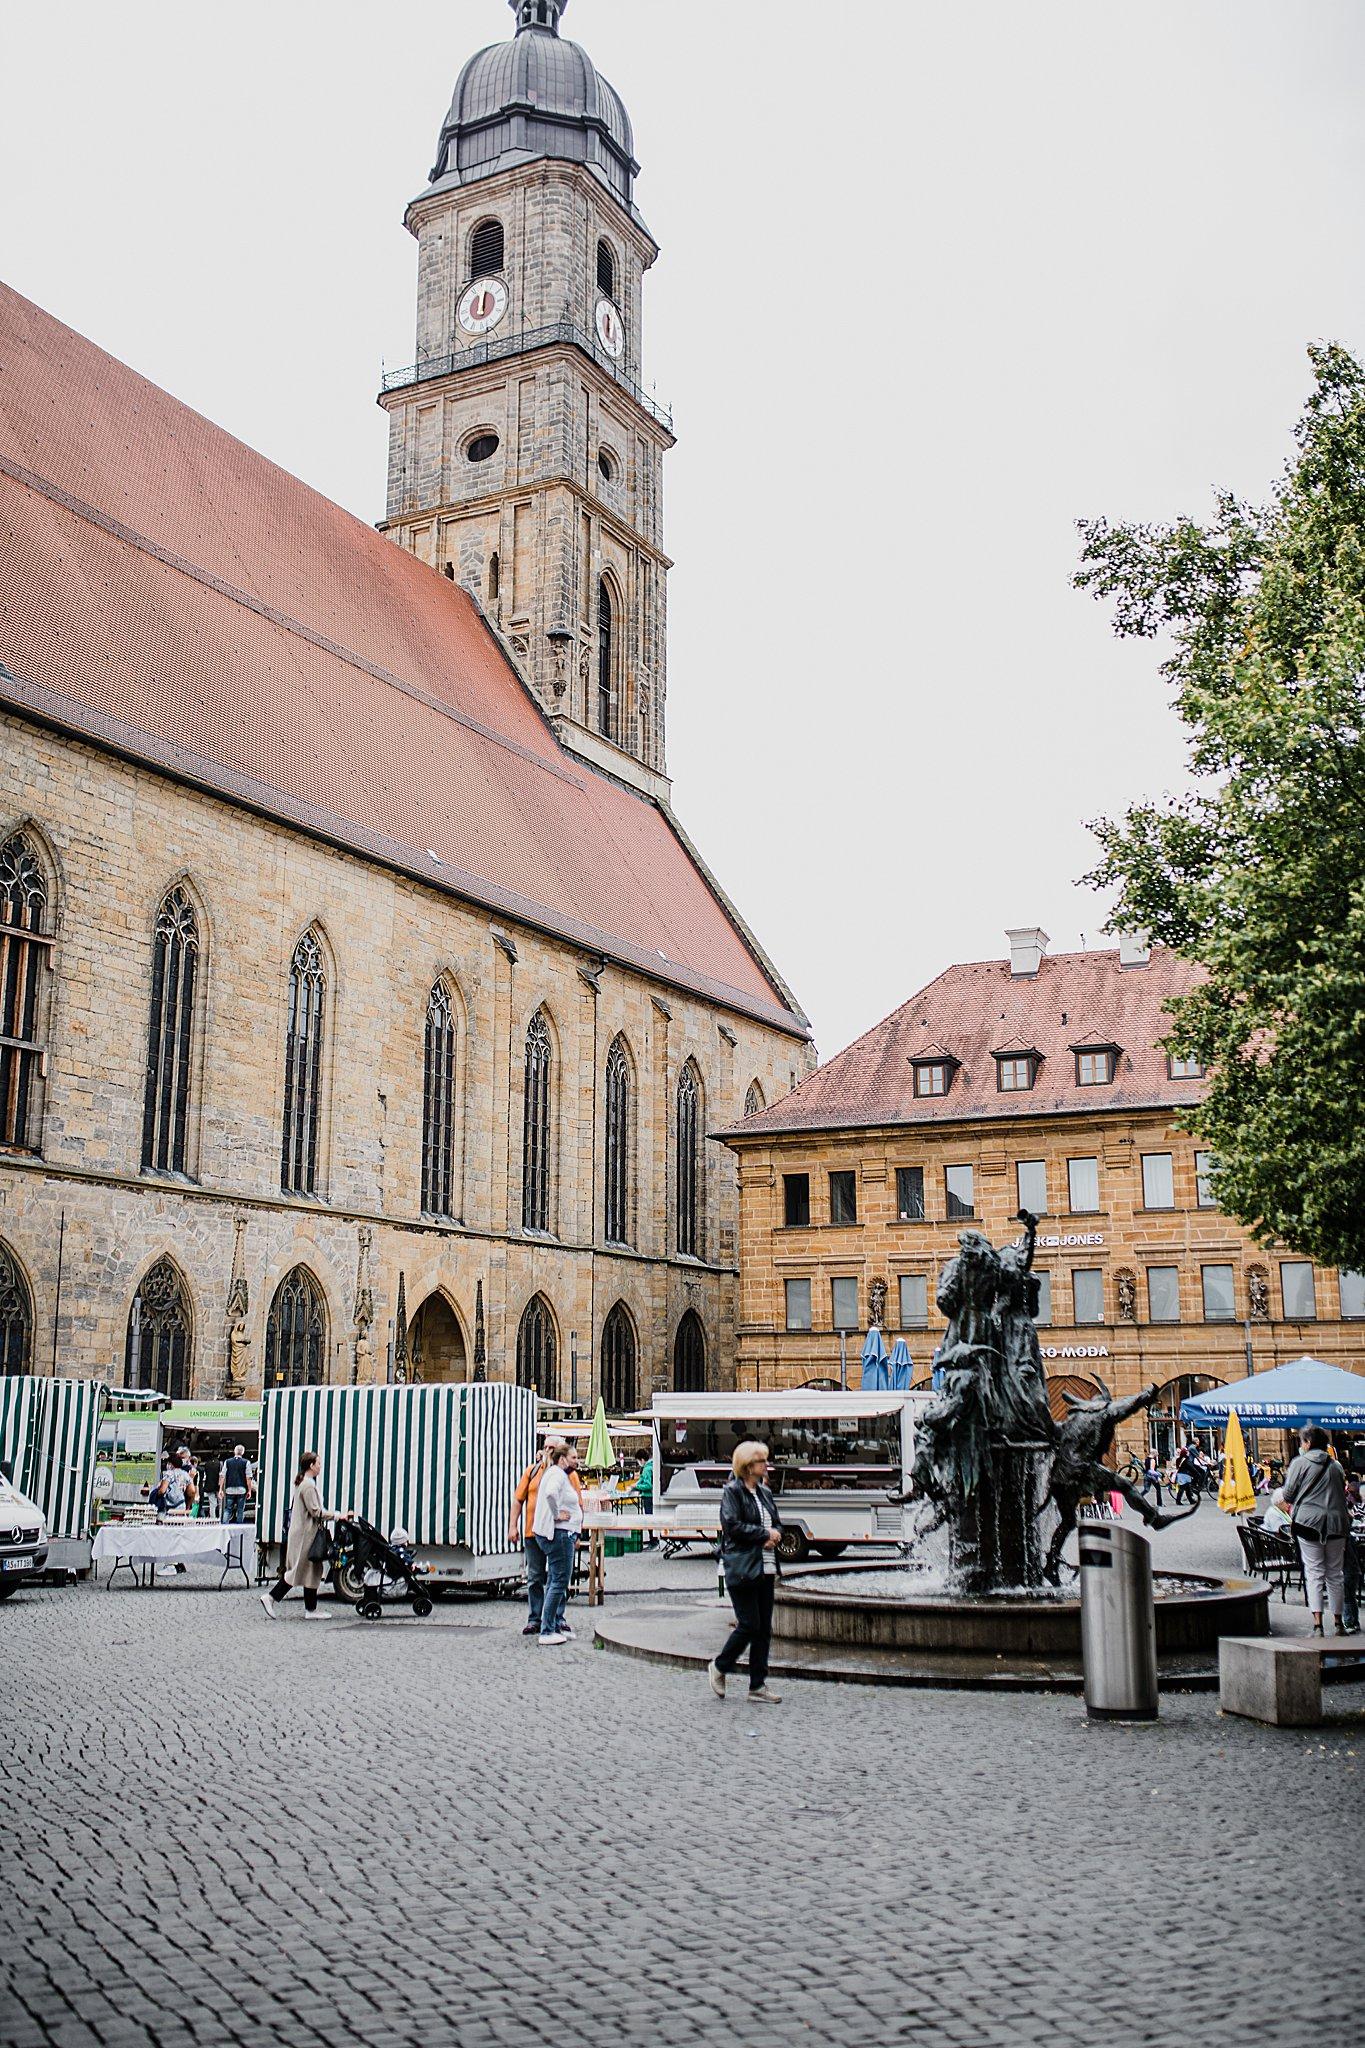 Hochzeitsfotograf-Oberpfalz-Bayern-Amberg_2690